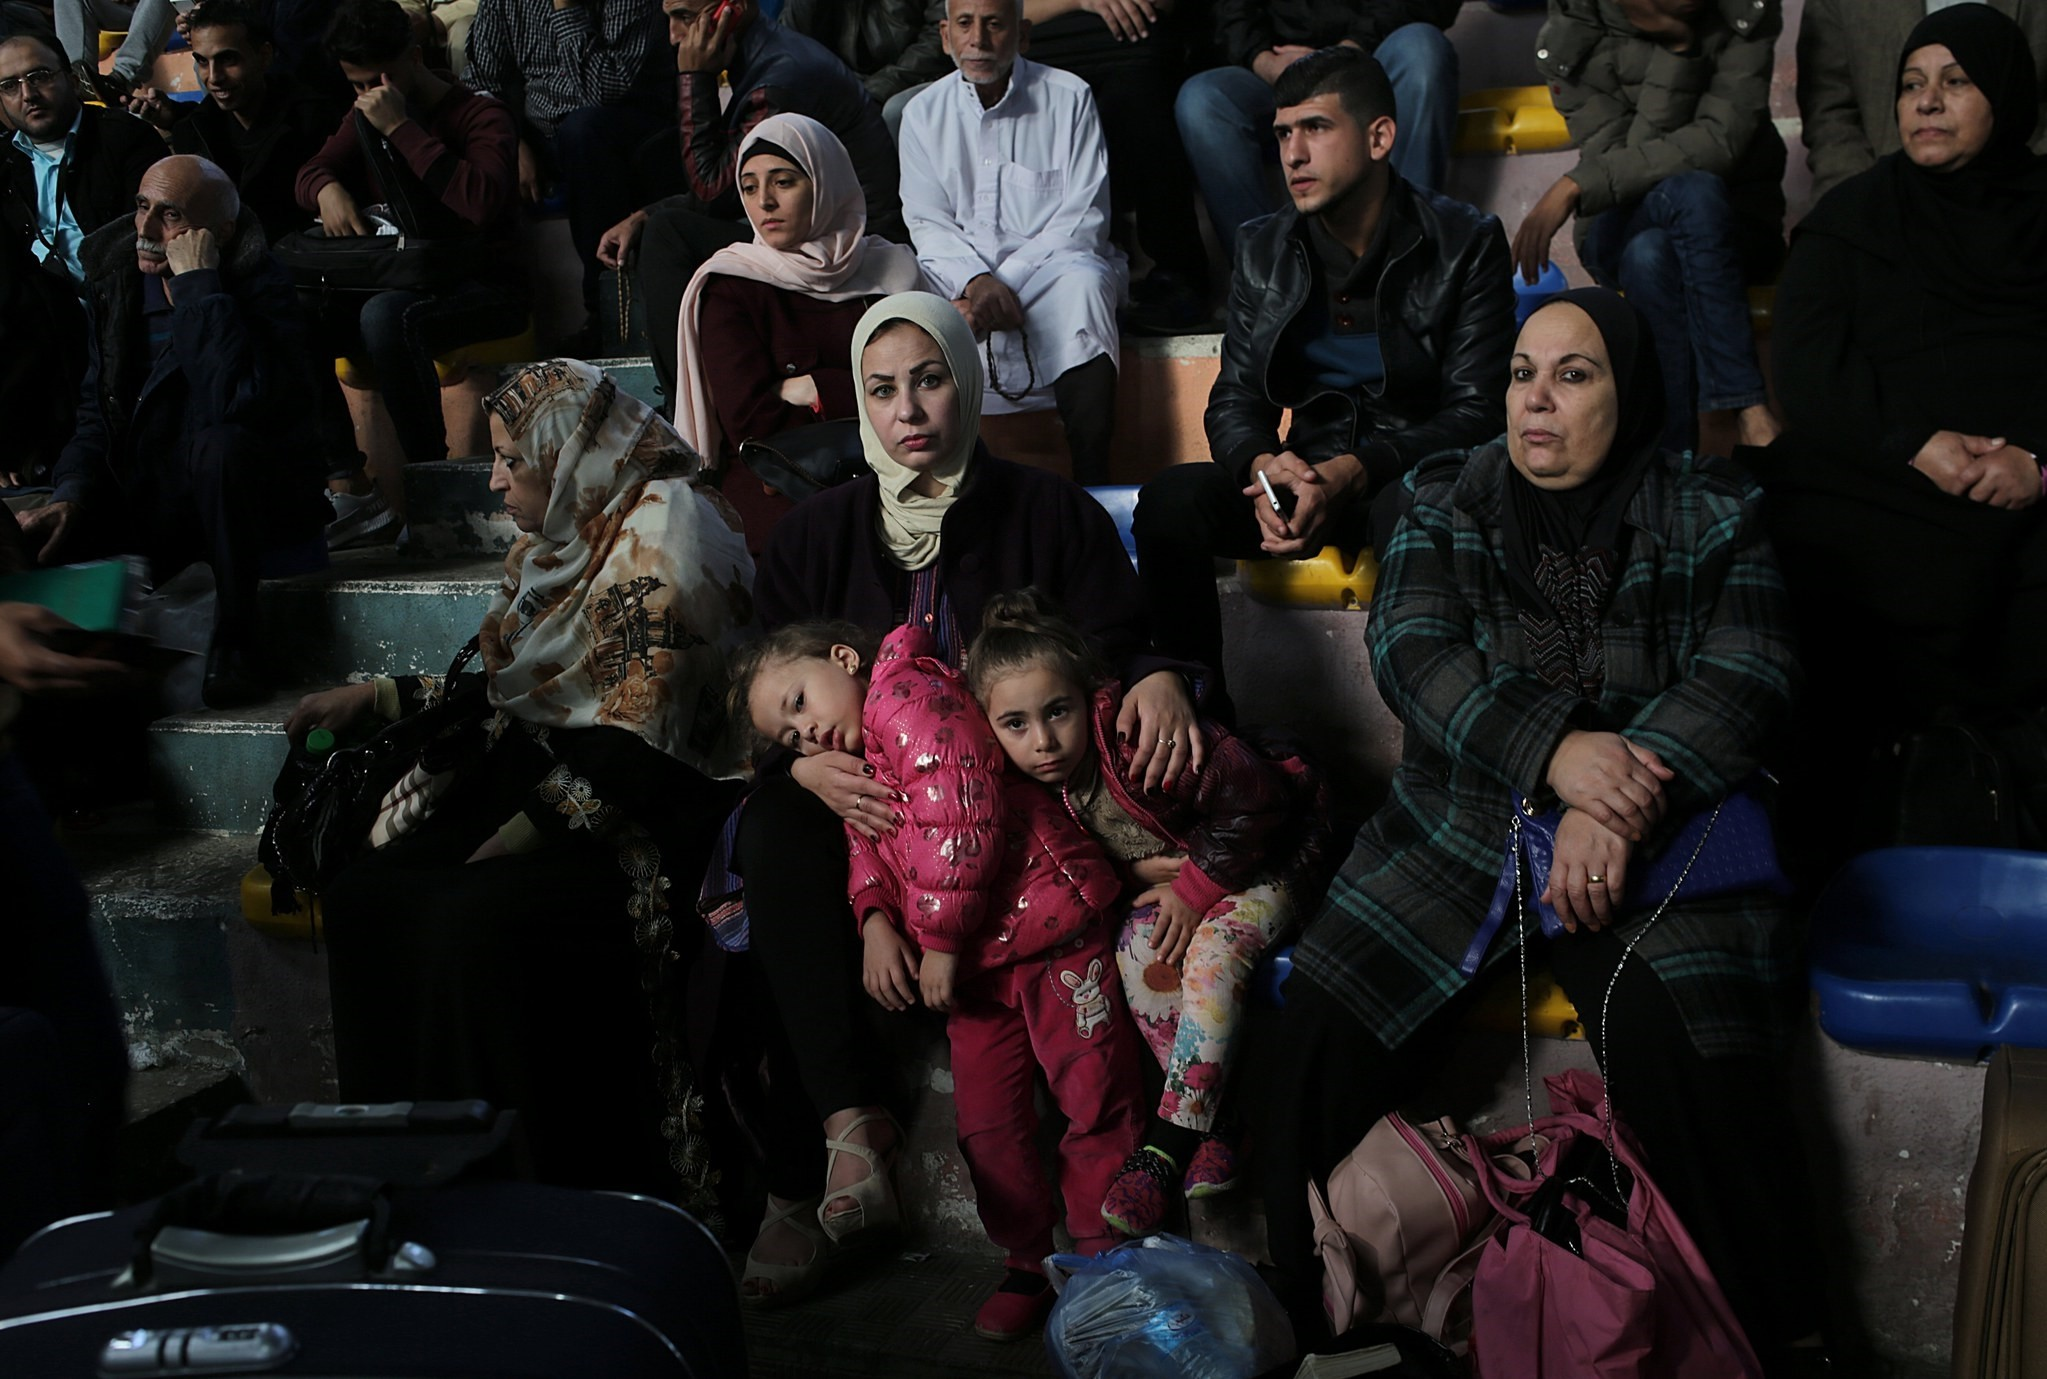 Palestinians wait to cross Rafah border with Egypt, in the Palestinian side, southern Gaza Strip, 18 November 2017. (EPA Photo)